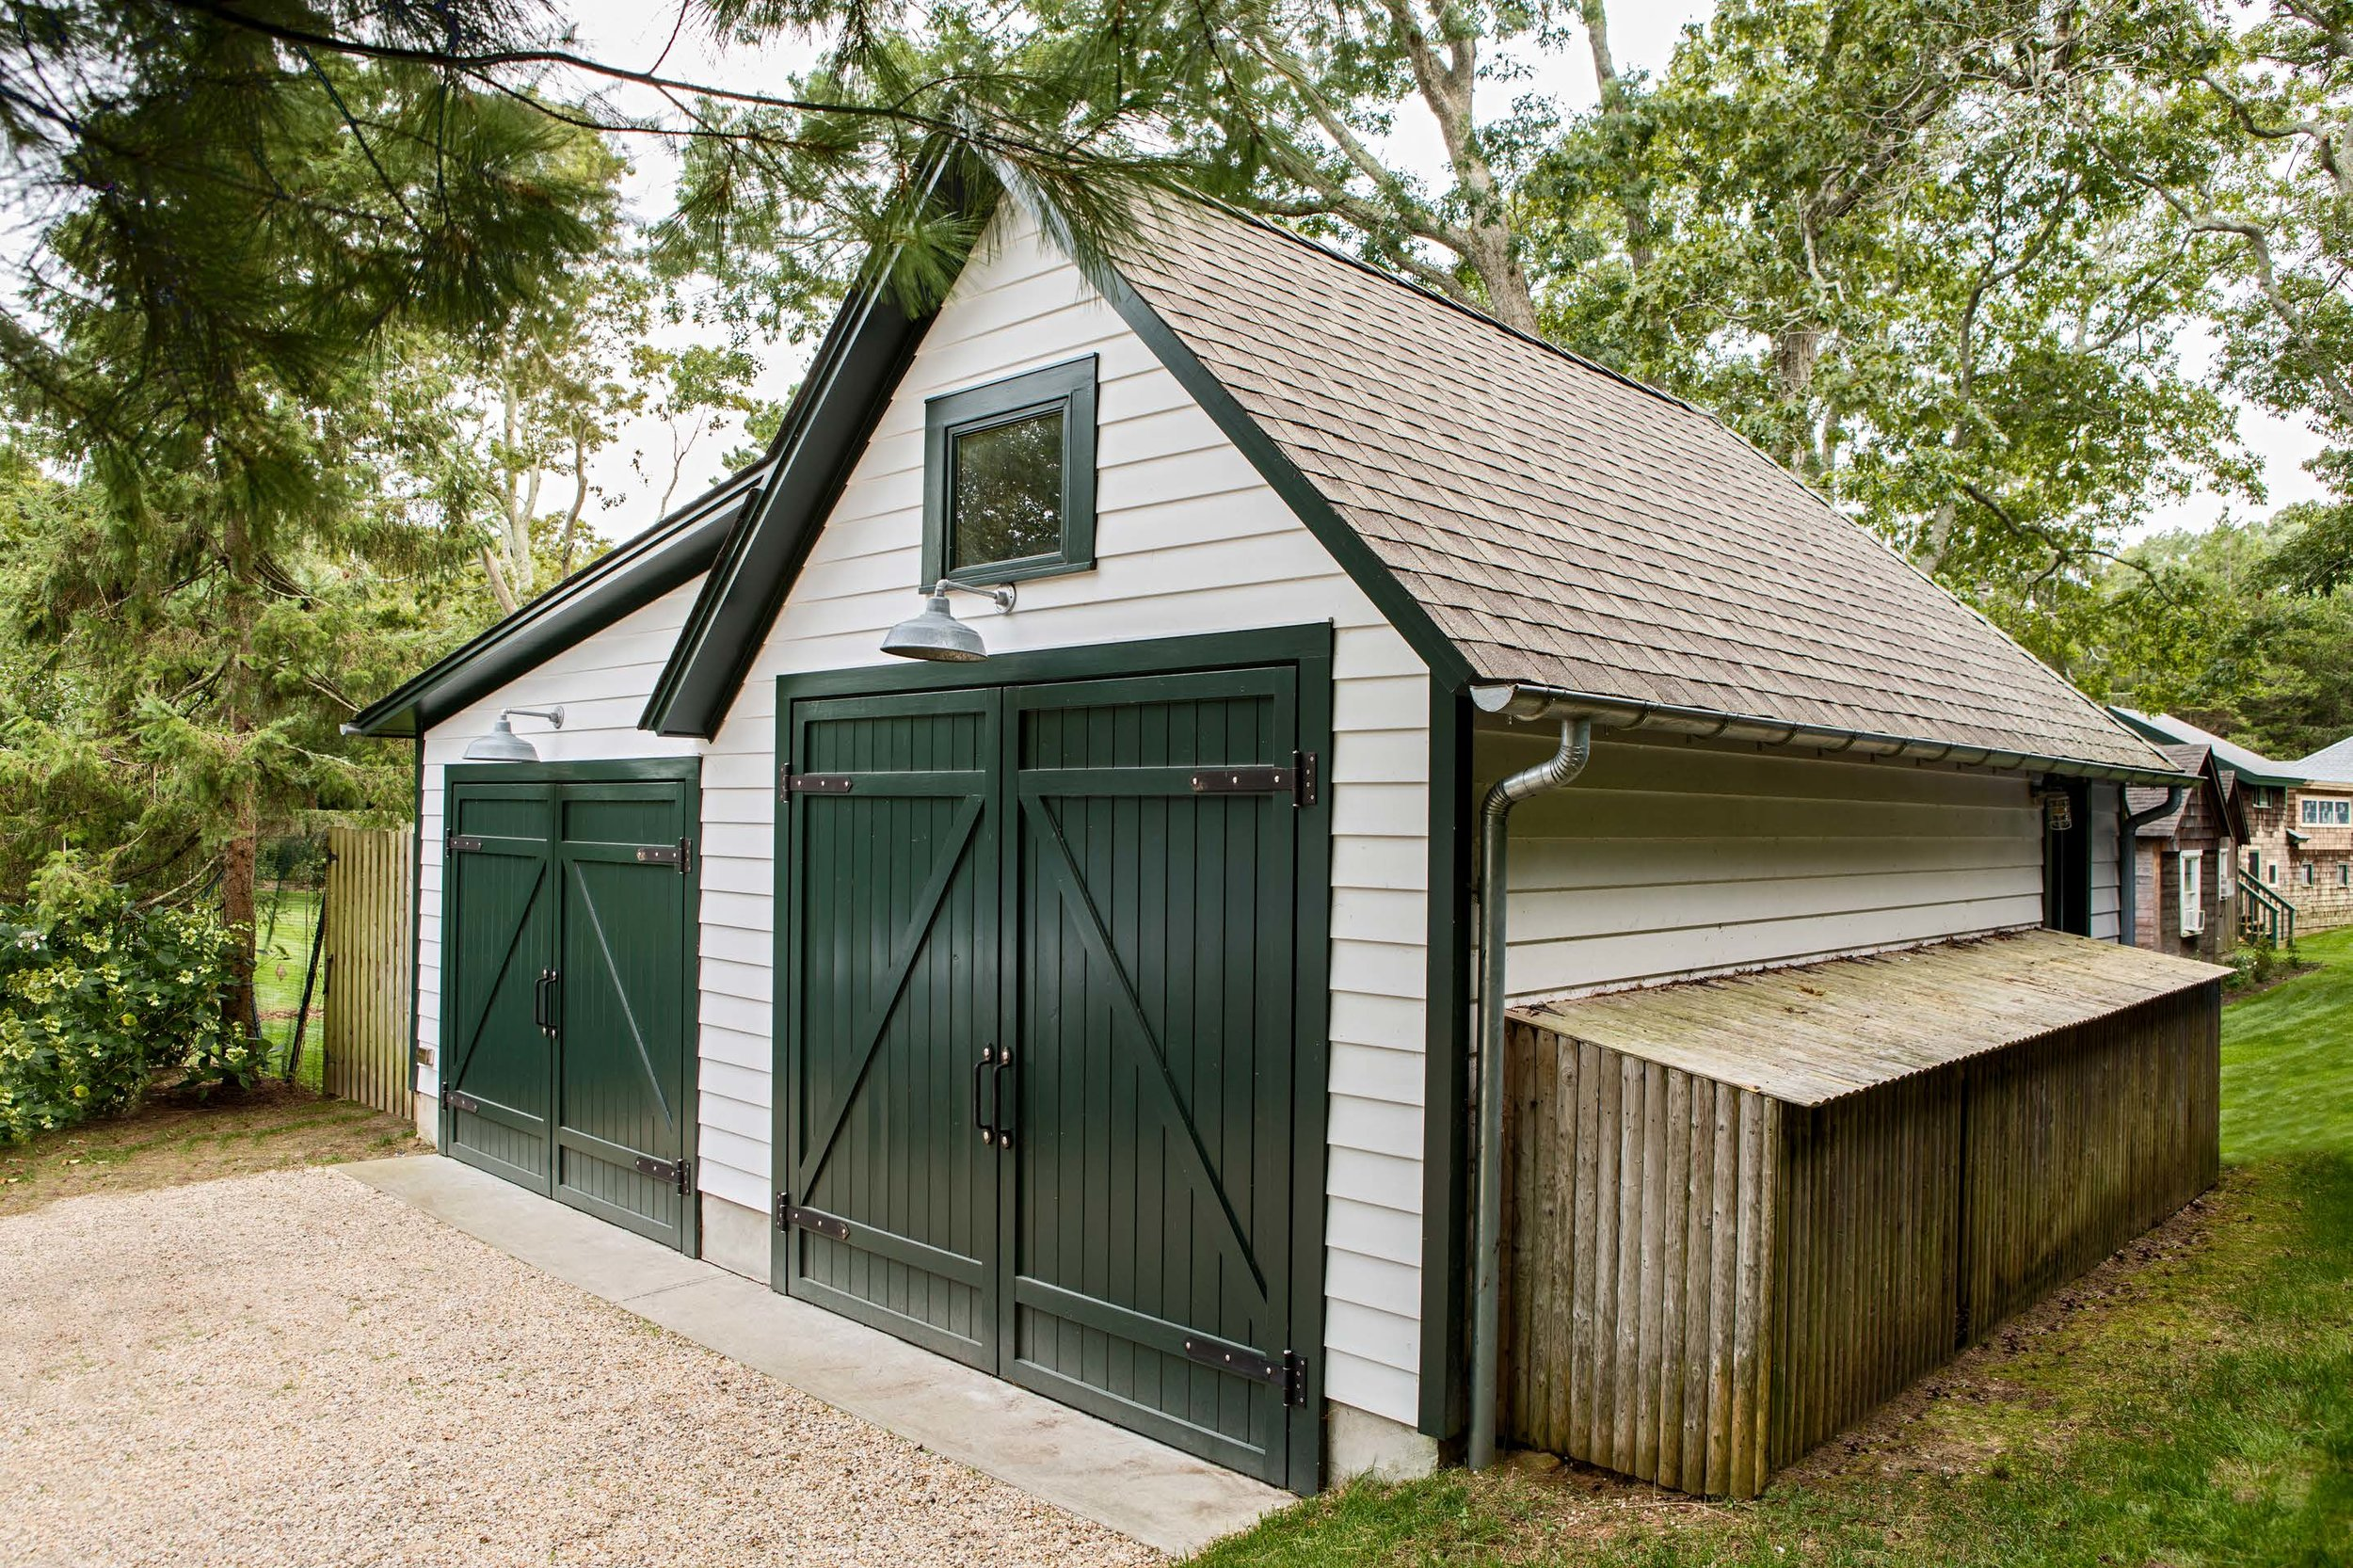 Flatow_Residence-Amagansett_Page_39.jpg